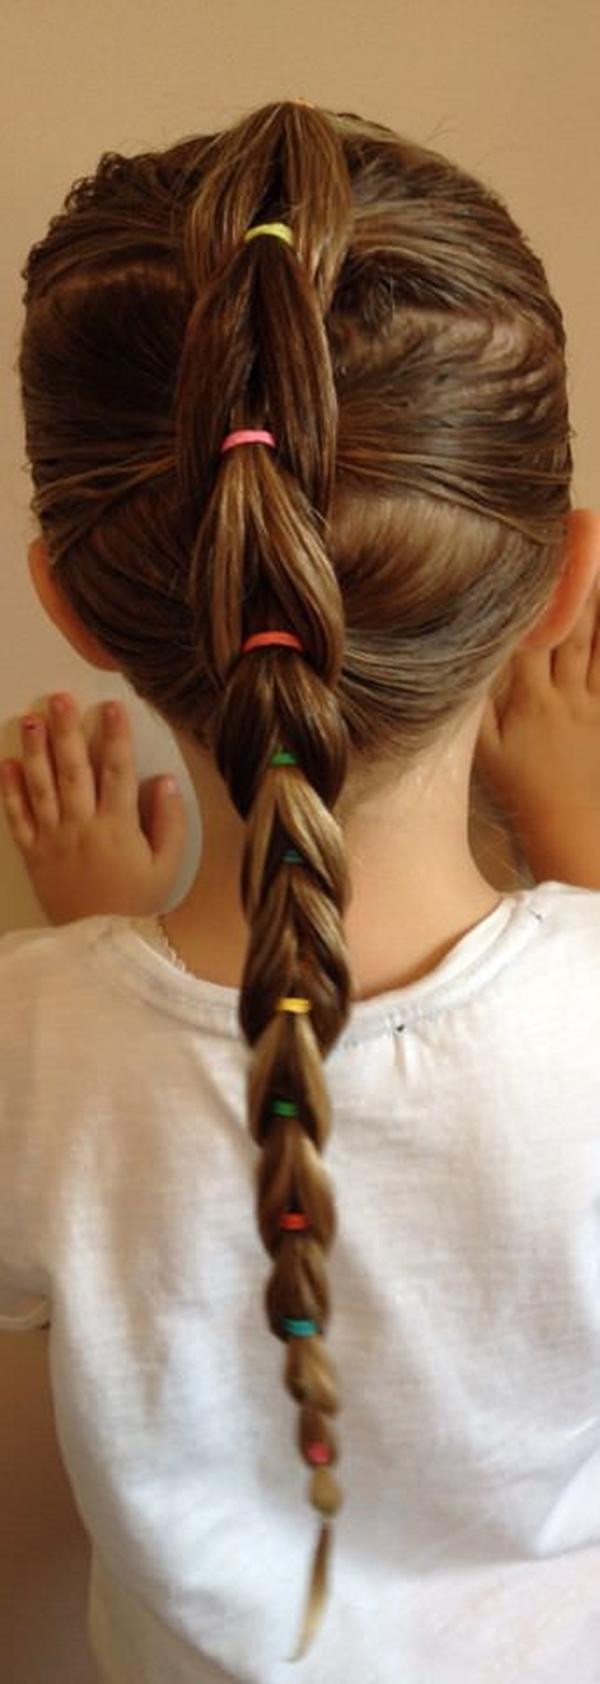 18150916-little-girl-hairstyles